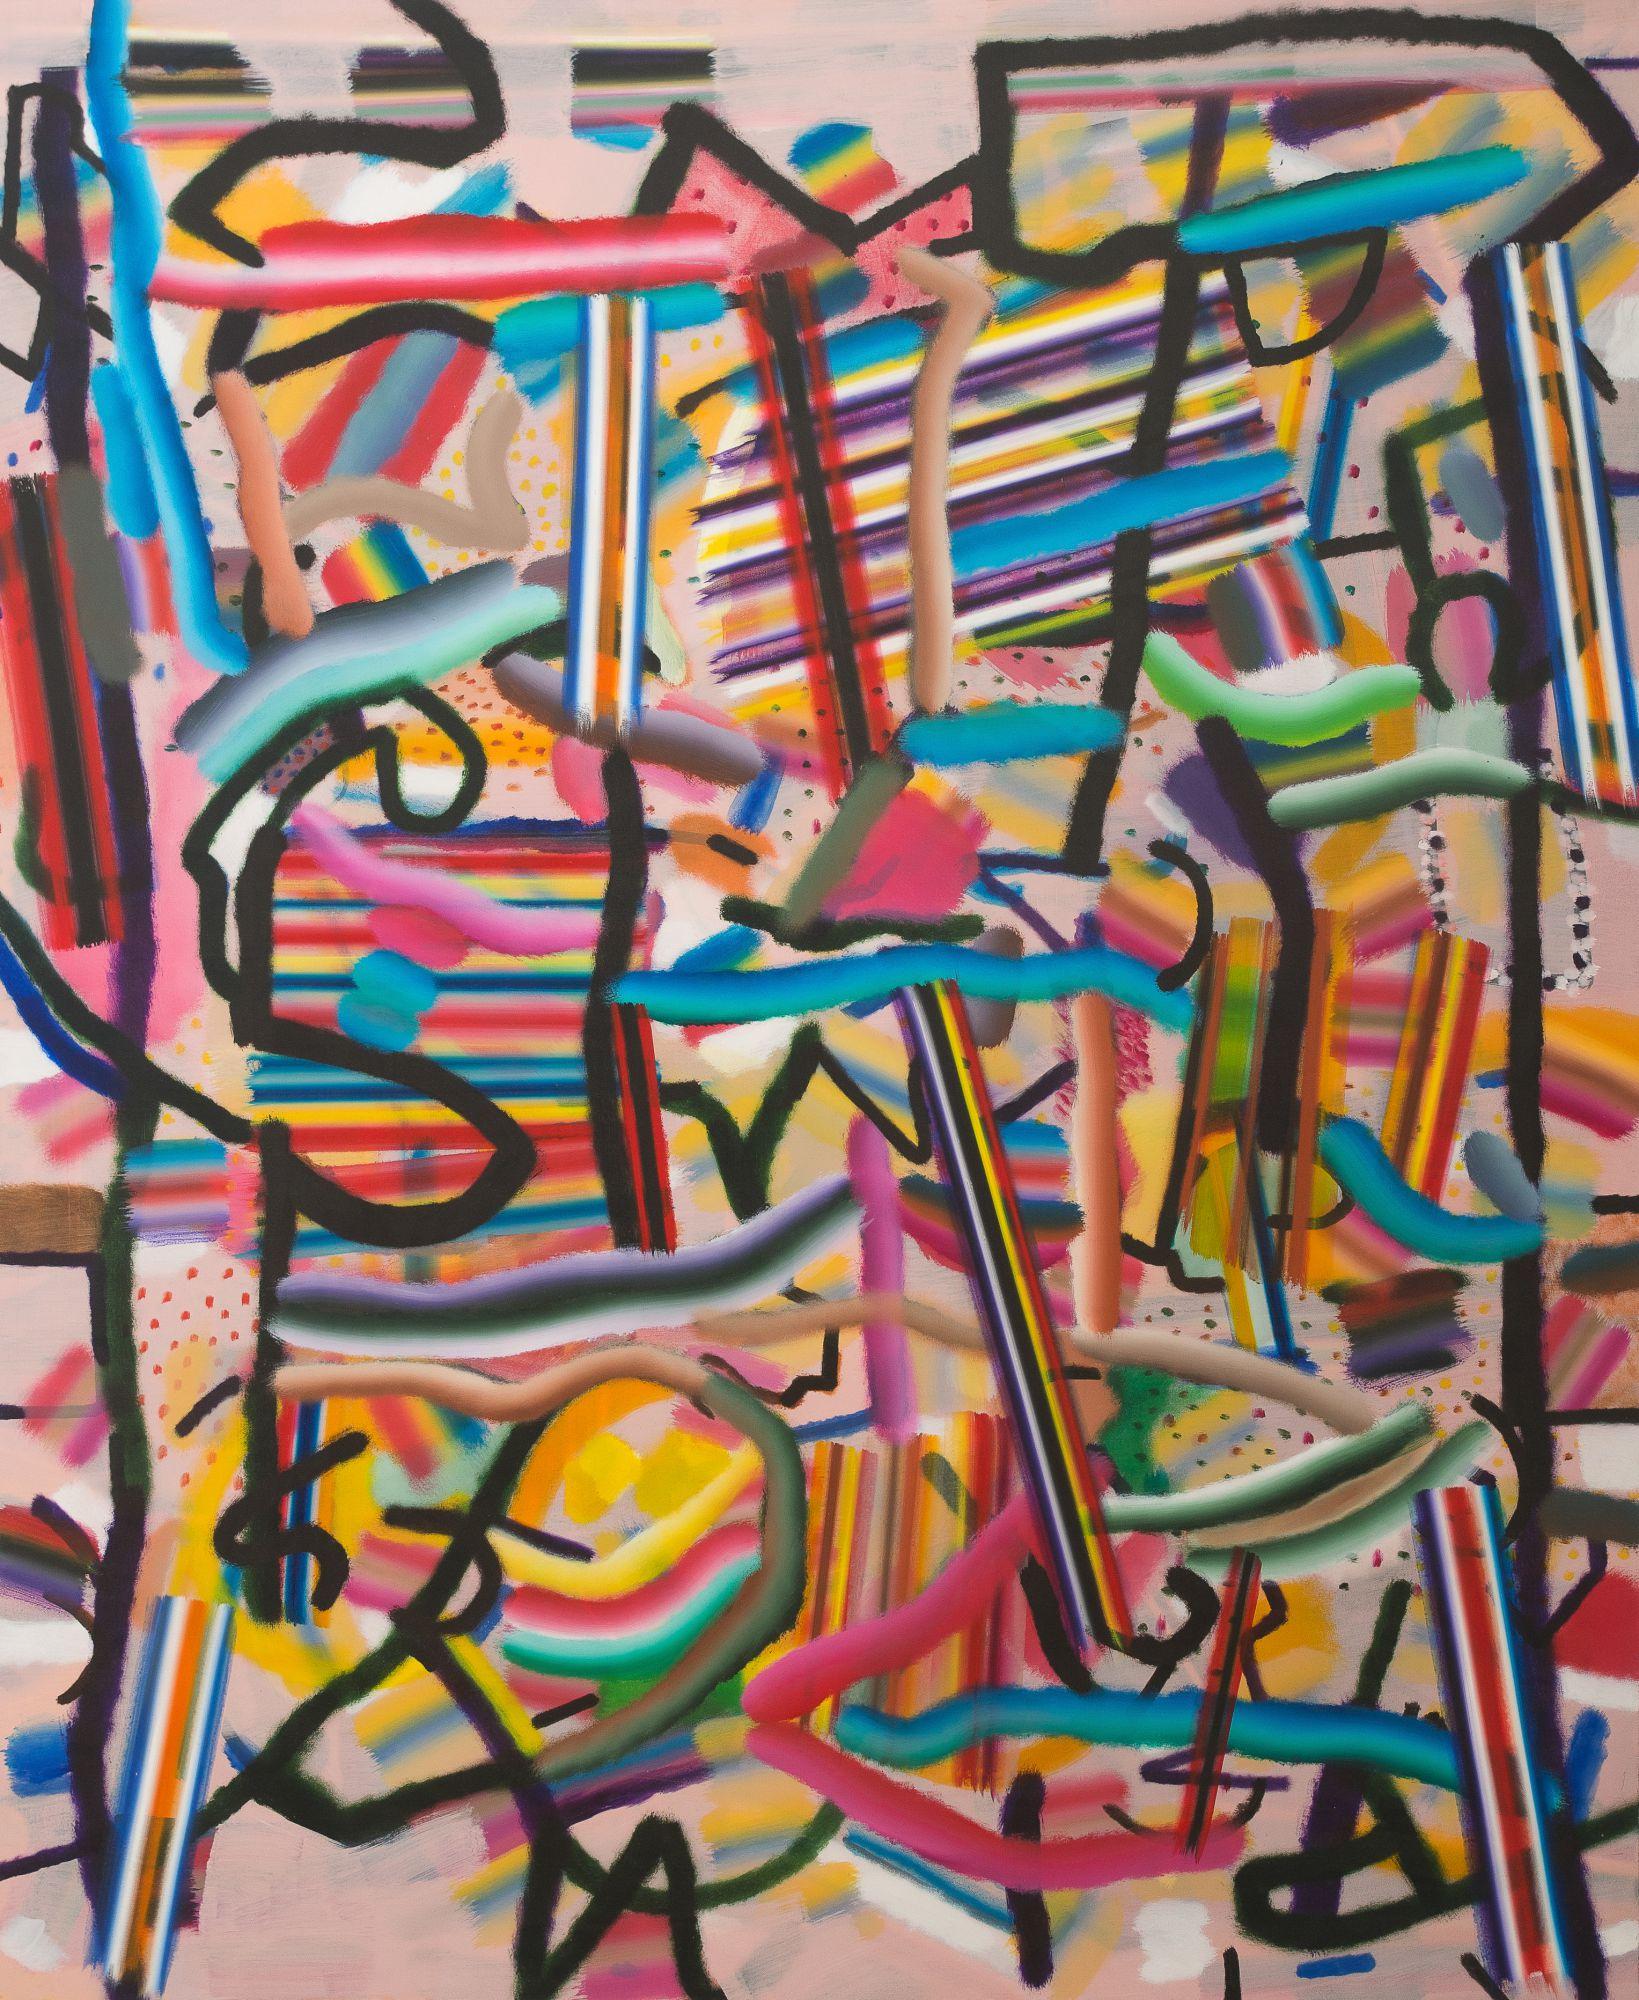 The Alphabet Painting